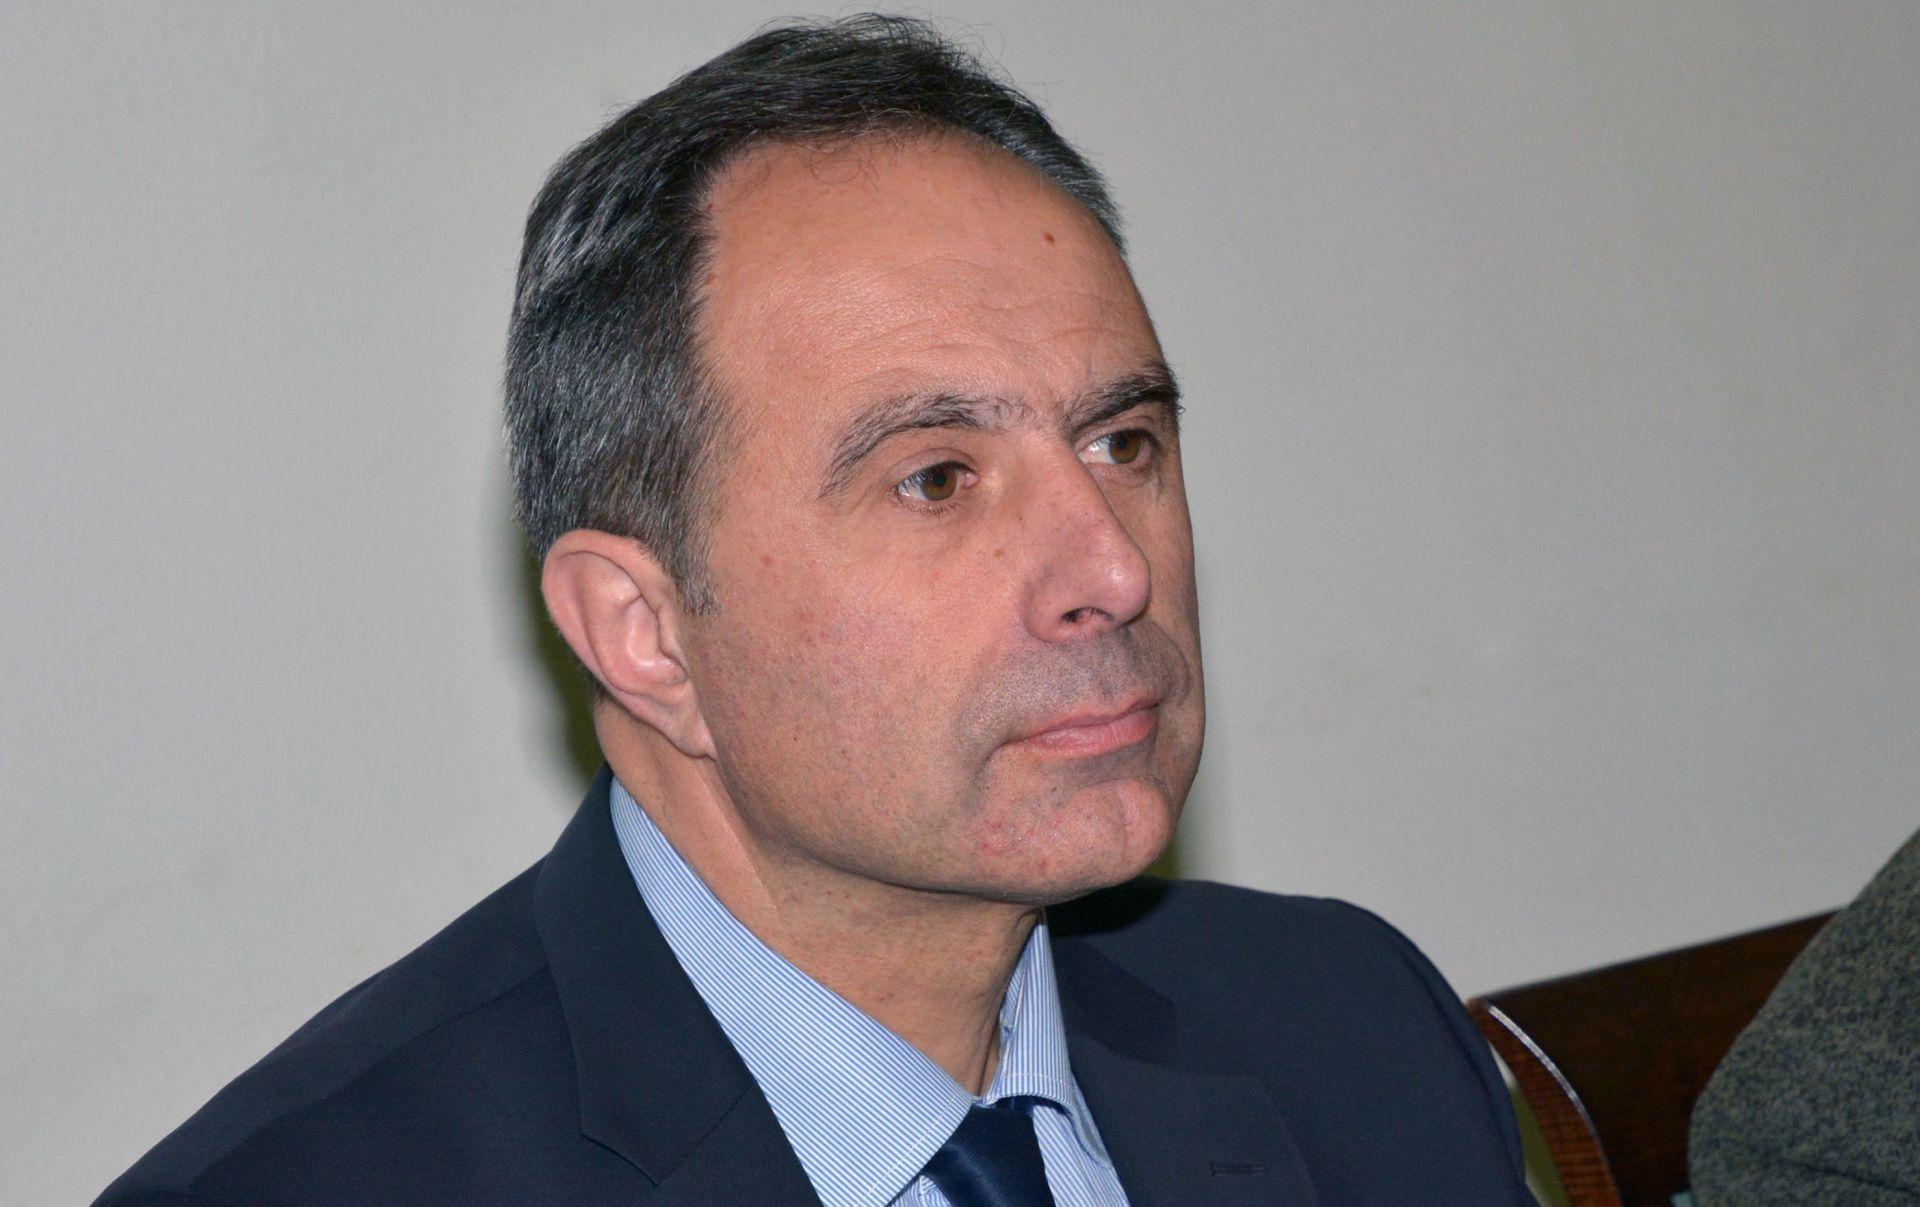 Novi-stari predsjednik HSP-a Daniel Srb